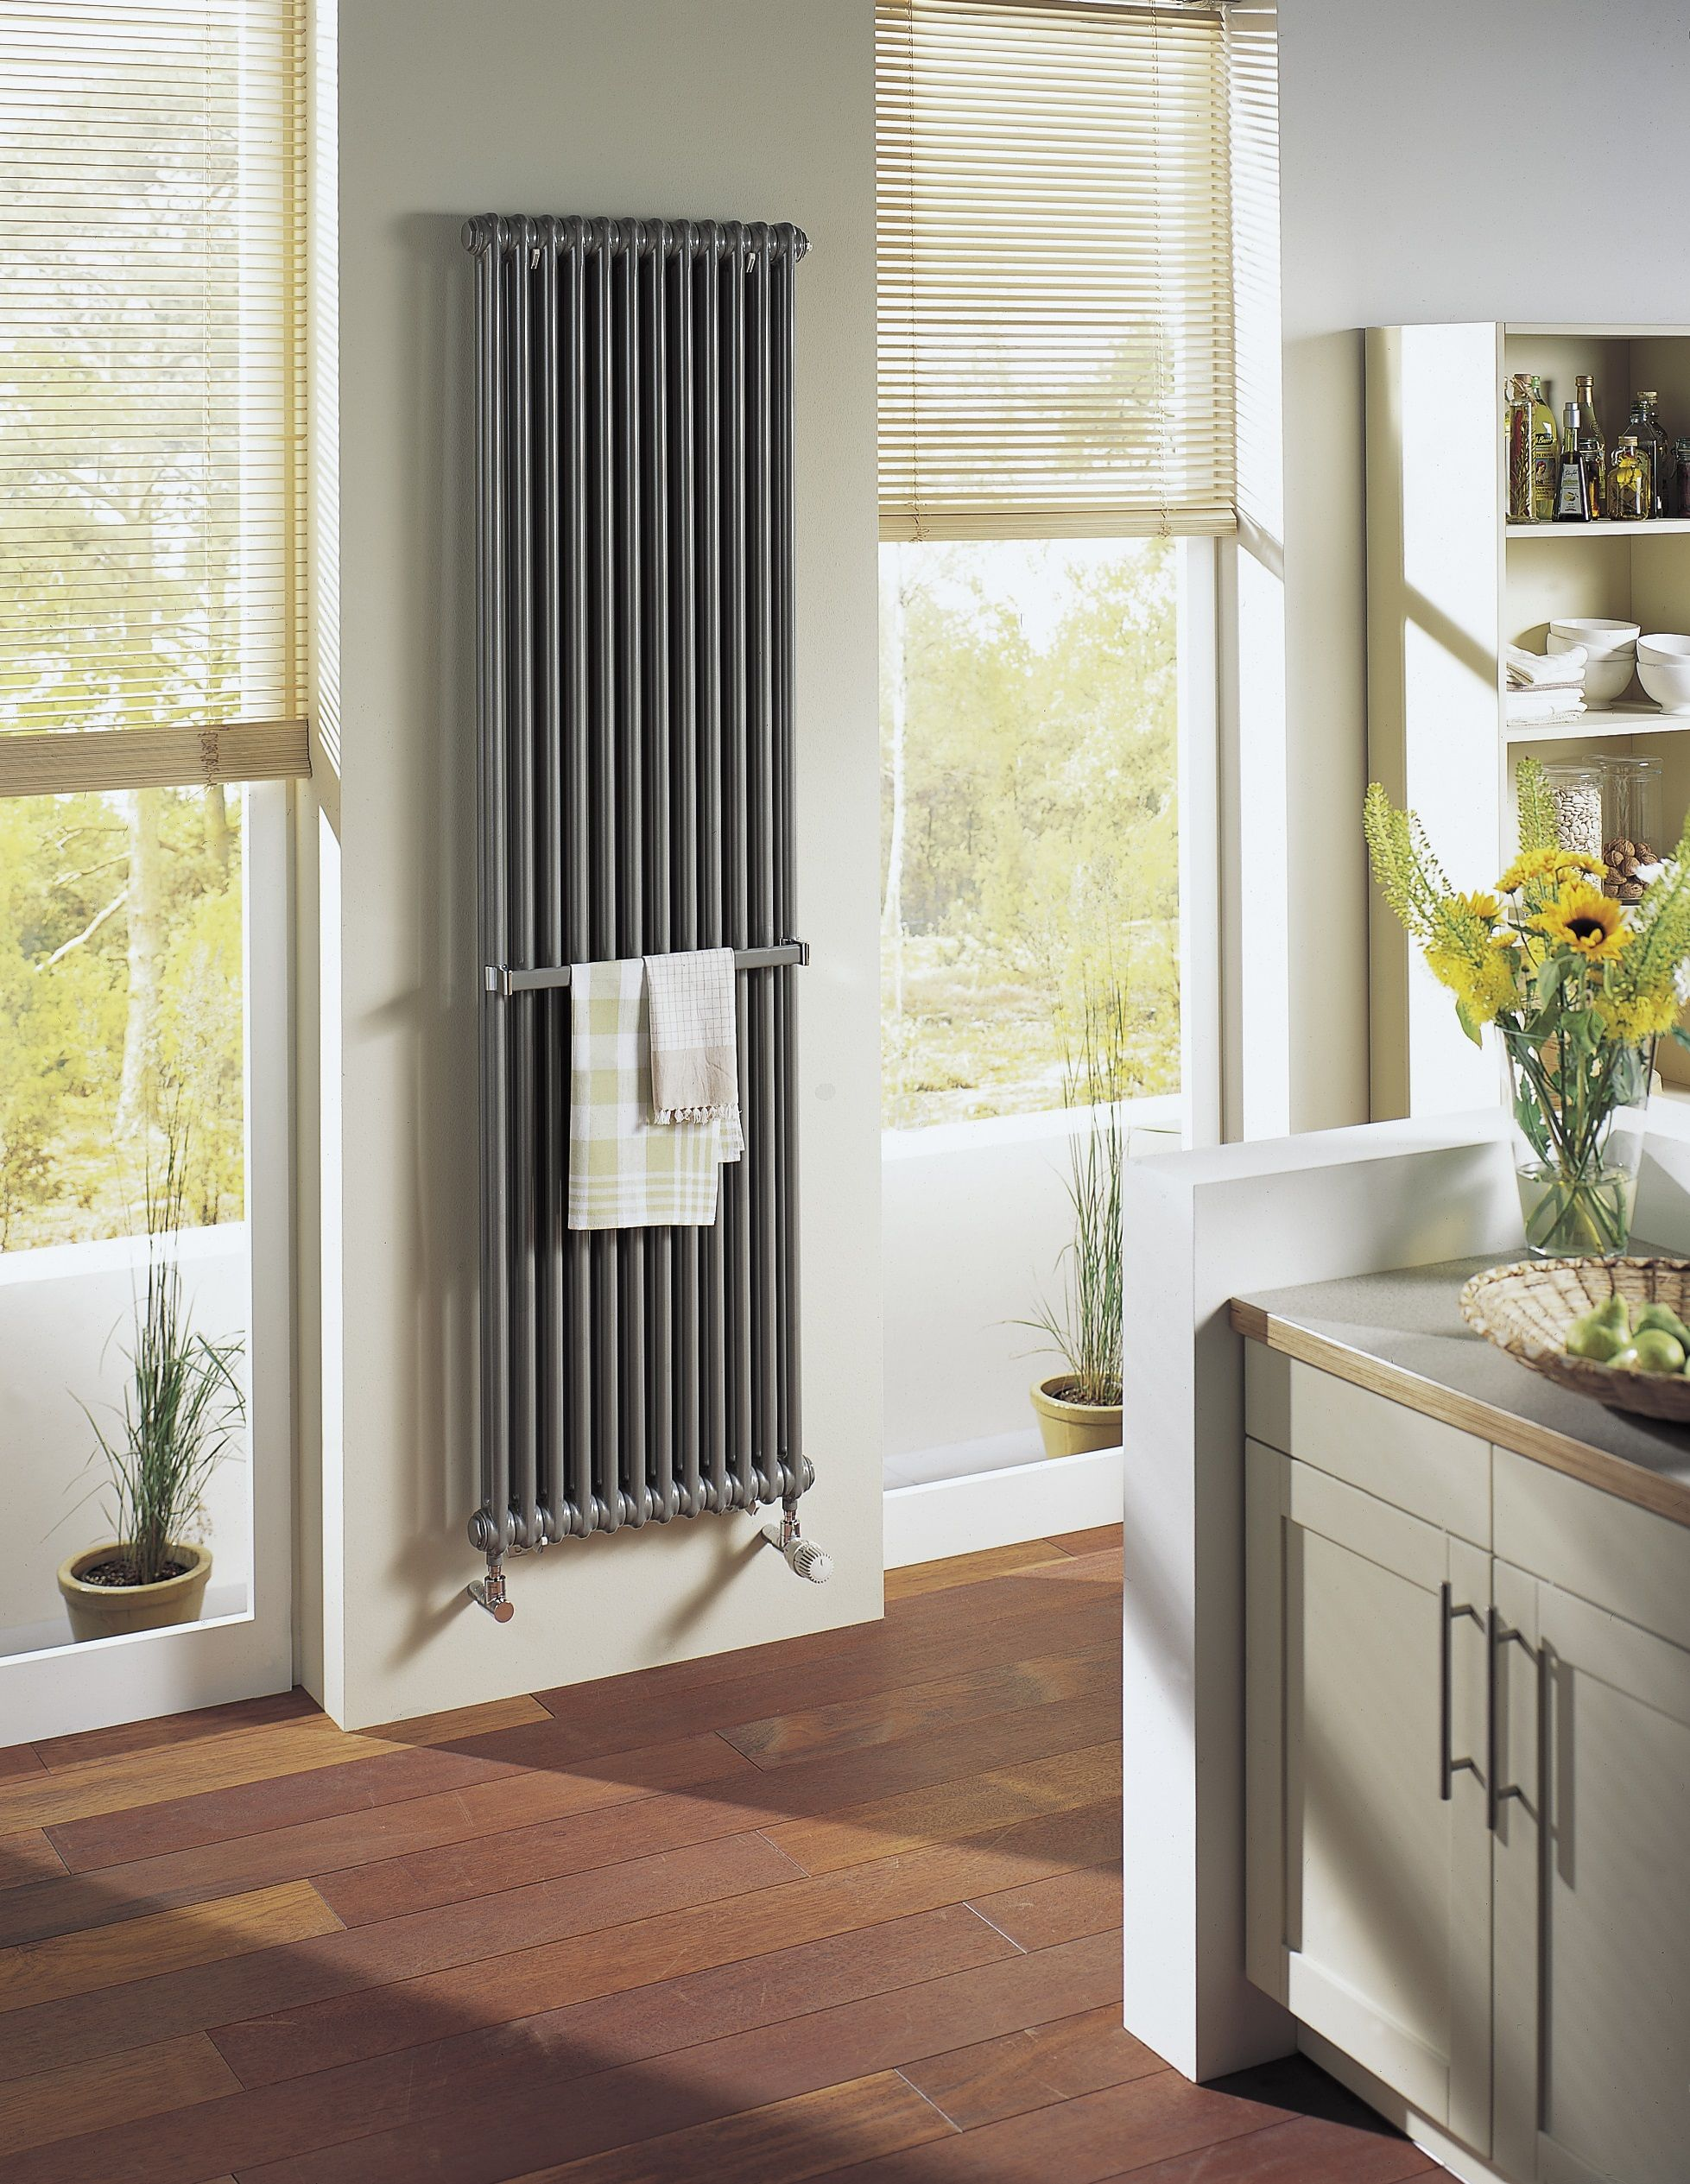 vertical column radiator radi tory pinterest haus k chen heizk rper und heizung. Black Bedroom Furniture Sets. Home Design Ideas